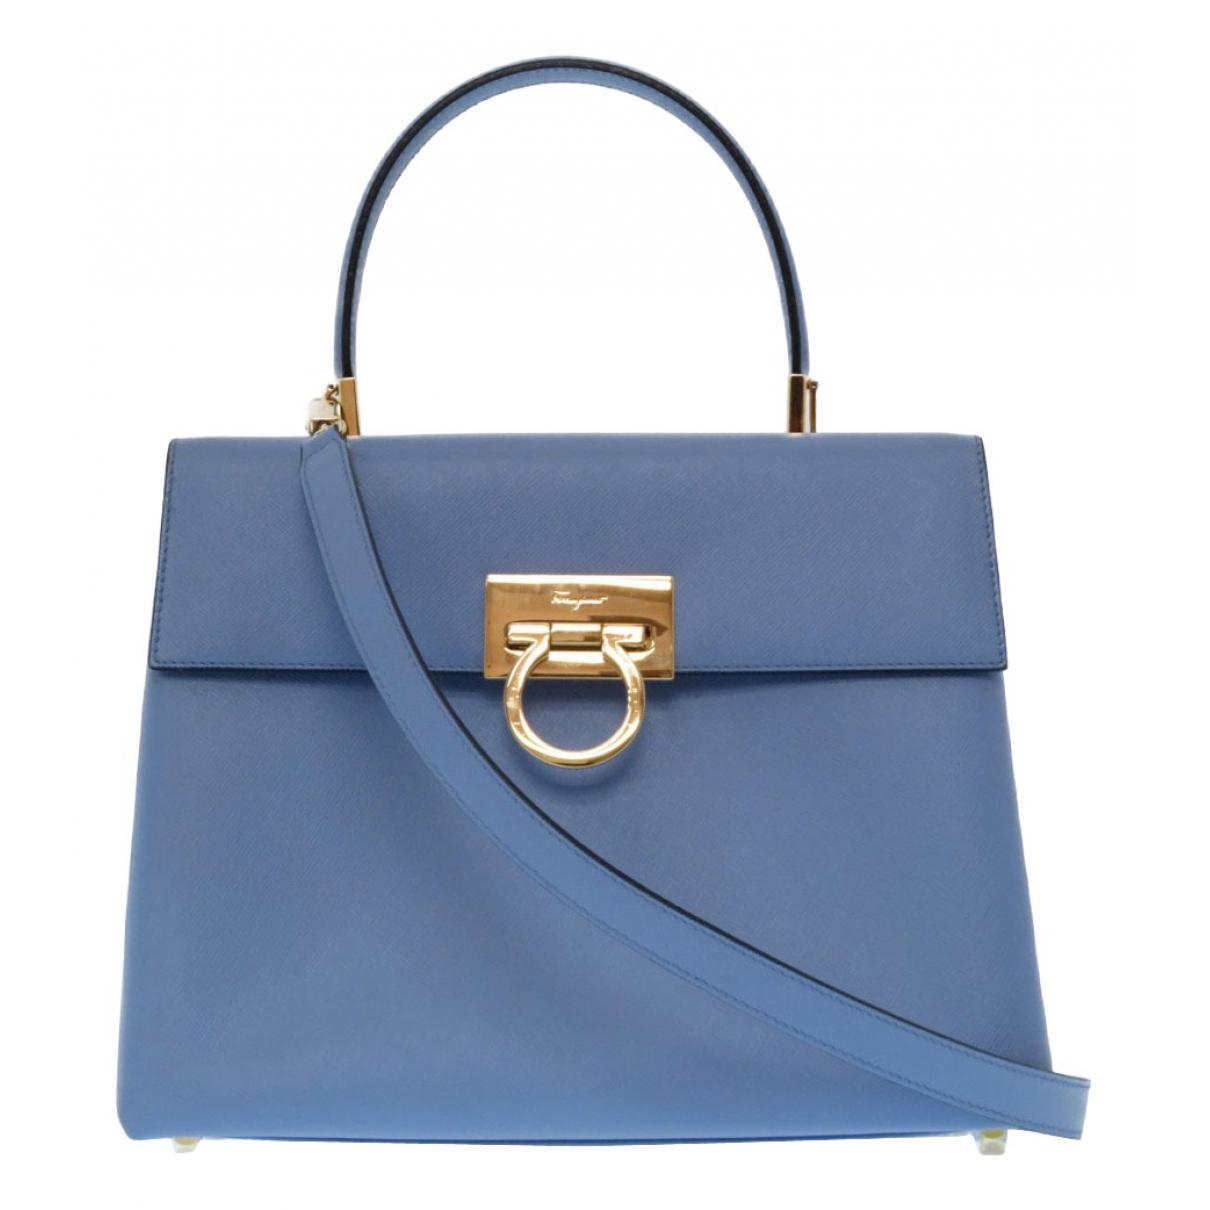 Salvatore Ferragamo - Sac a main   pour femme en cuir - bleu